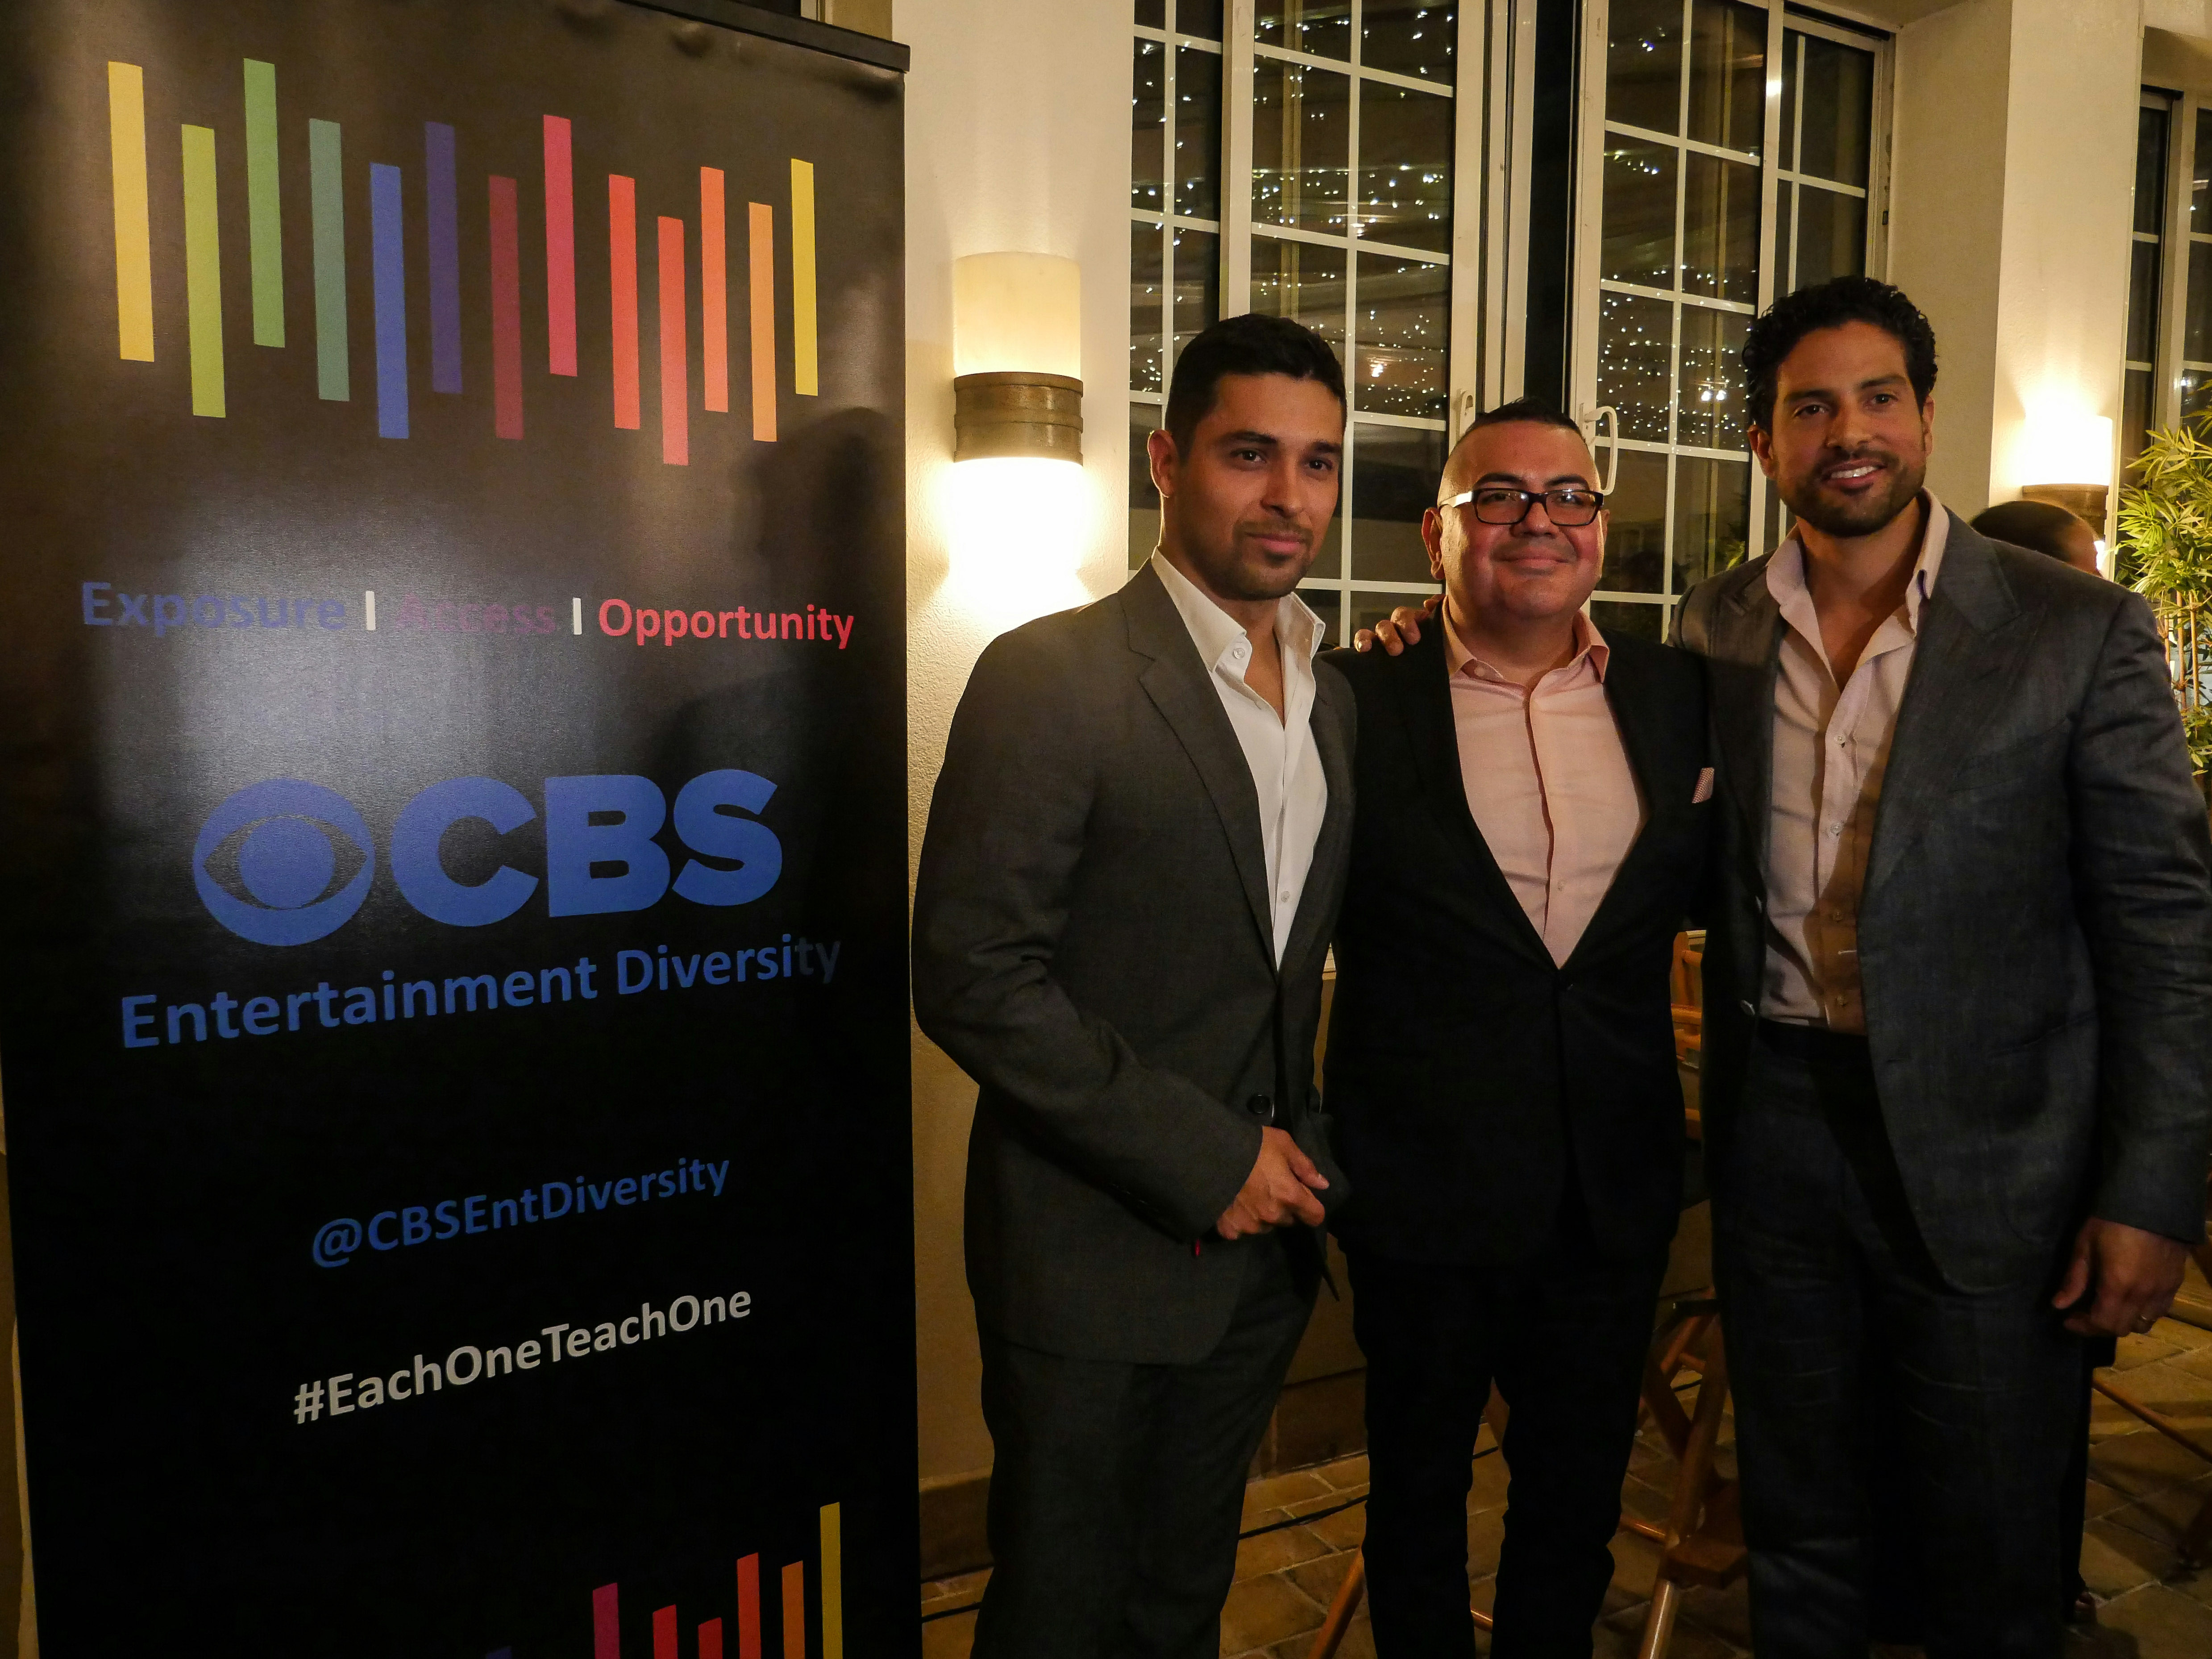 CBS_Diversity.jpg